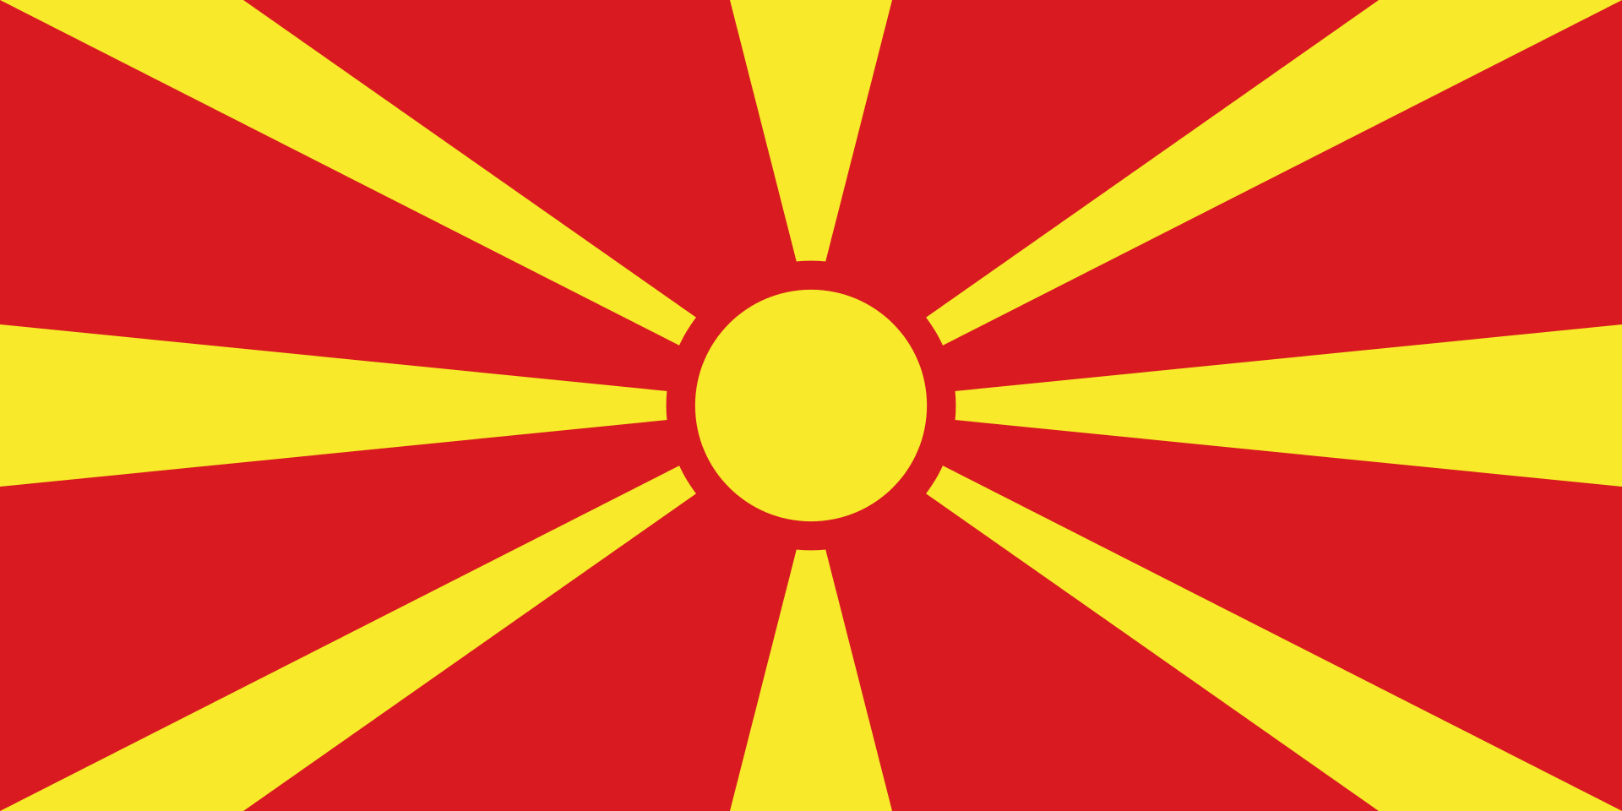 Flagge im  Land Makedonien 150x100 cm